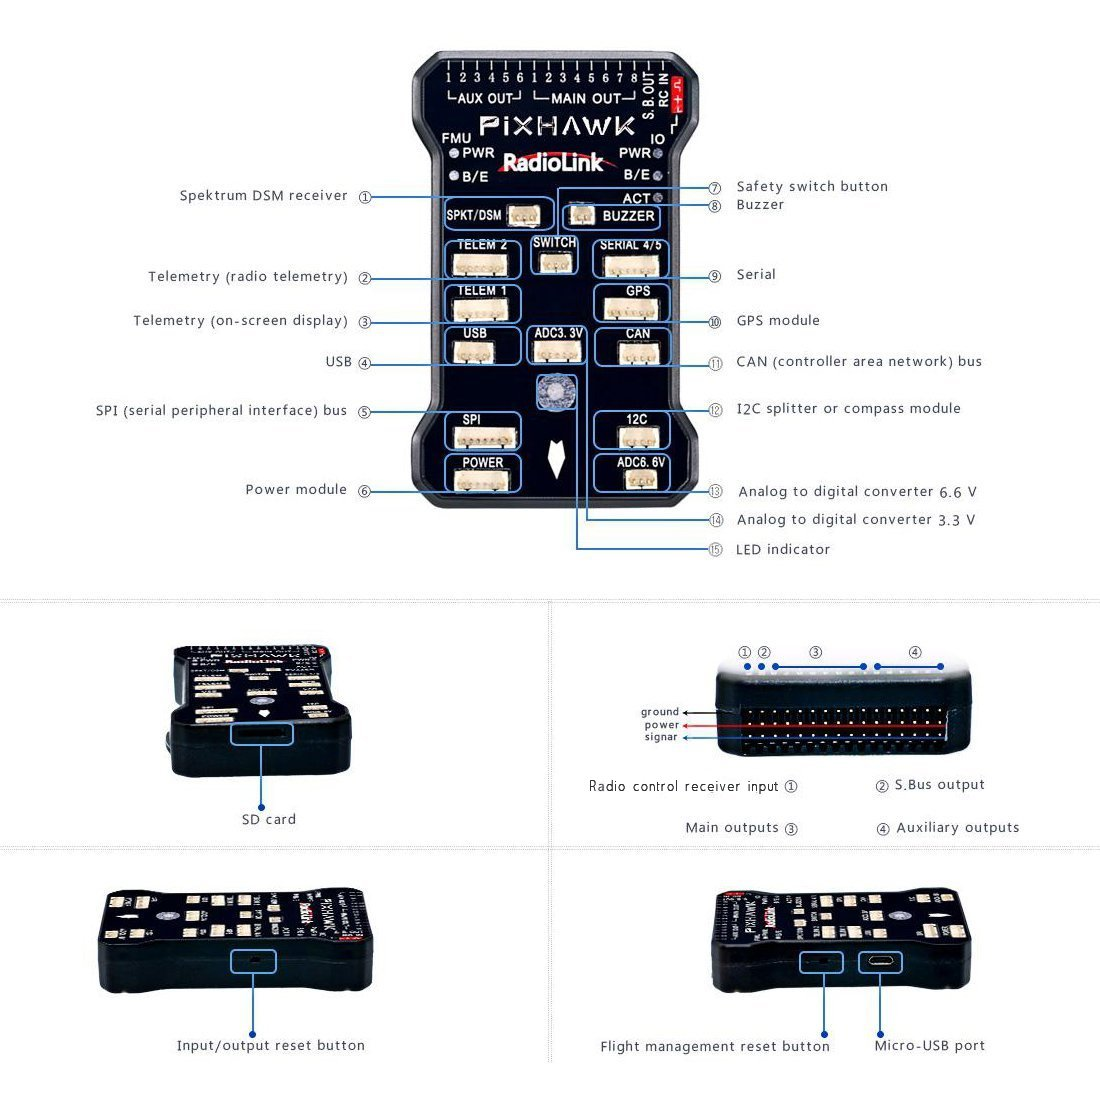 Amazon.com: Radiolink Pixhawk PX4 32 Bit ARM Flight Controller + NEO ...